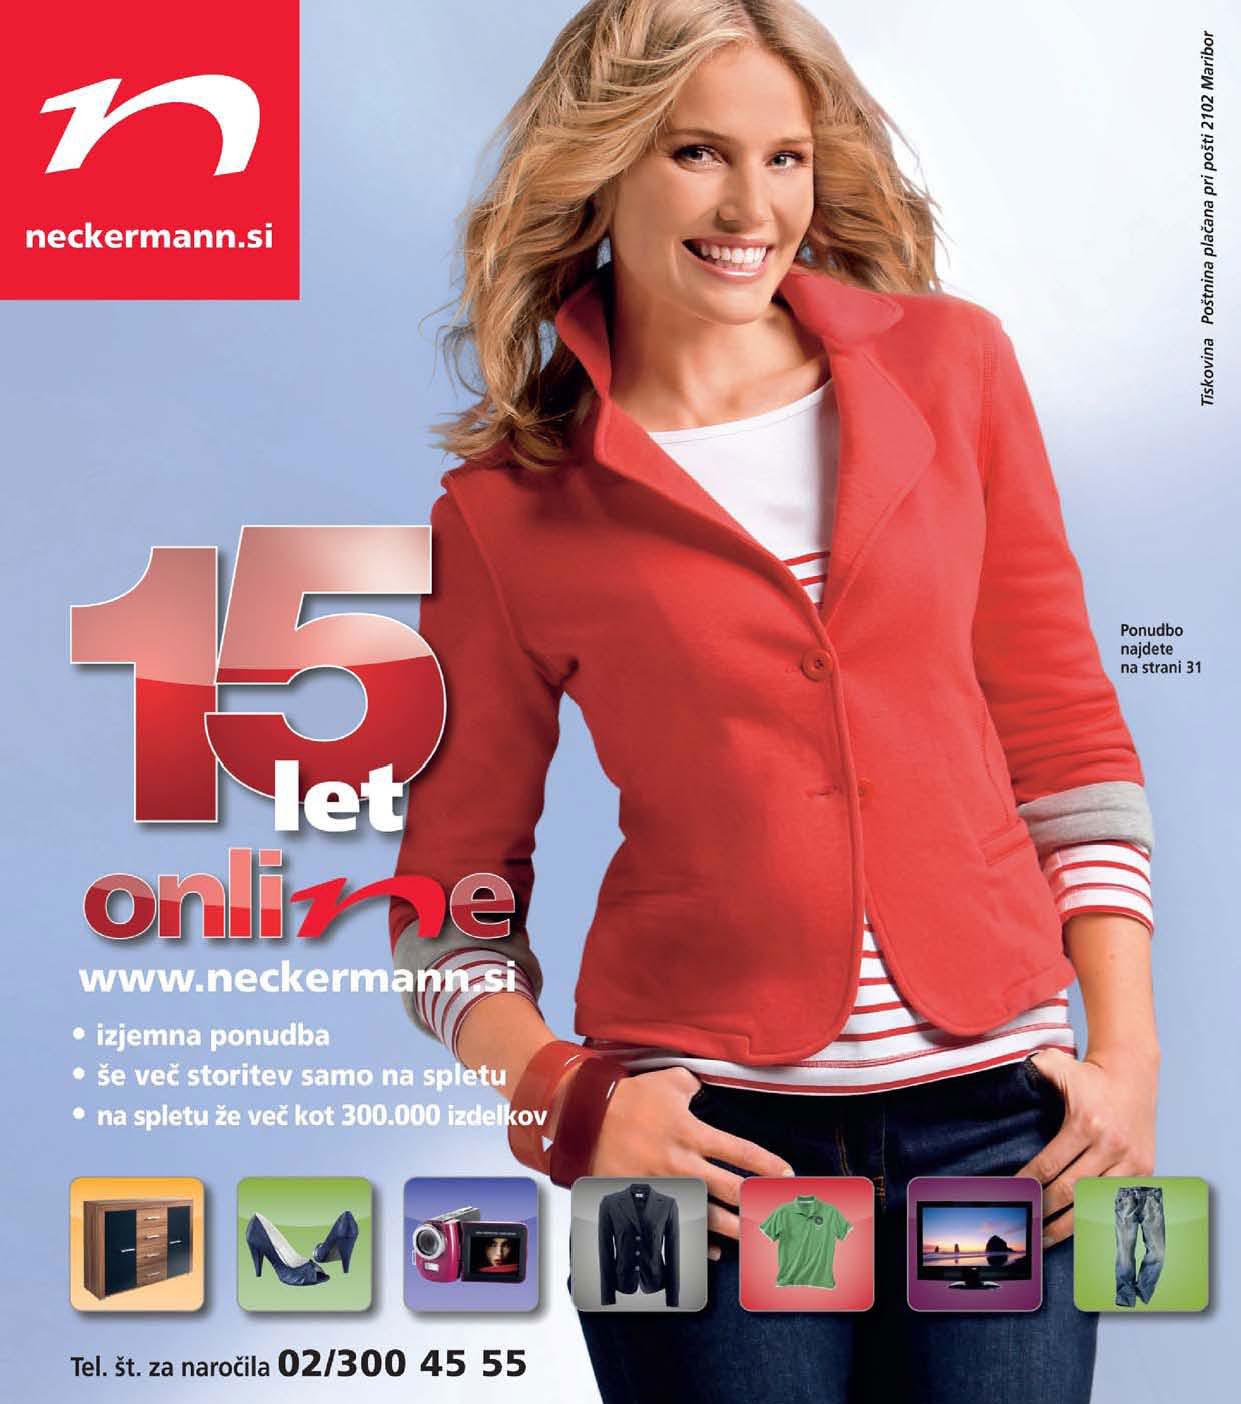 Neckermann - Glavni katalog Pomlad/poletje 2011